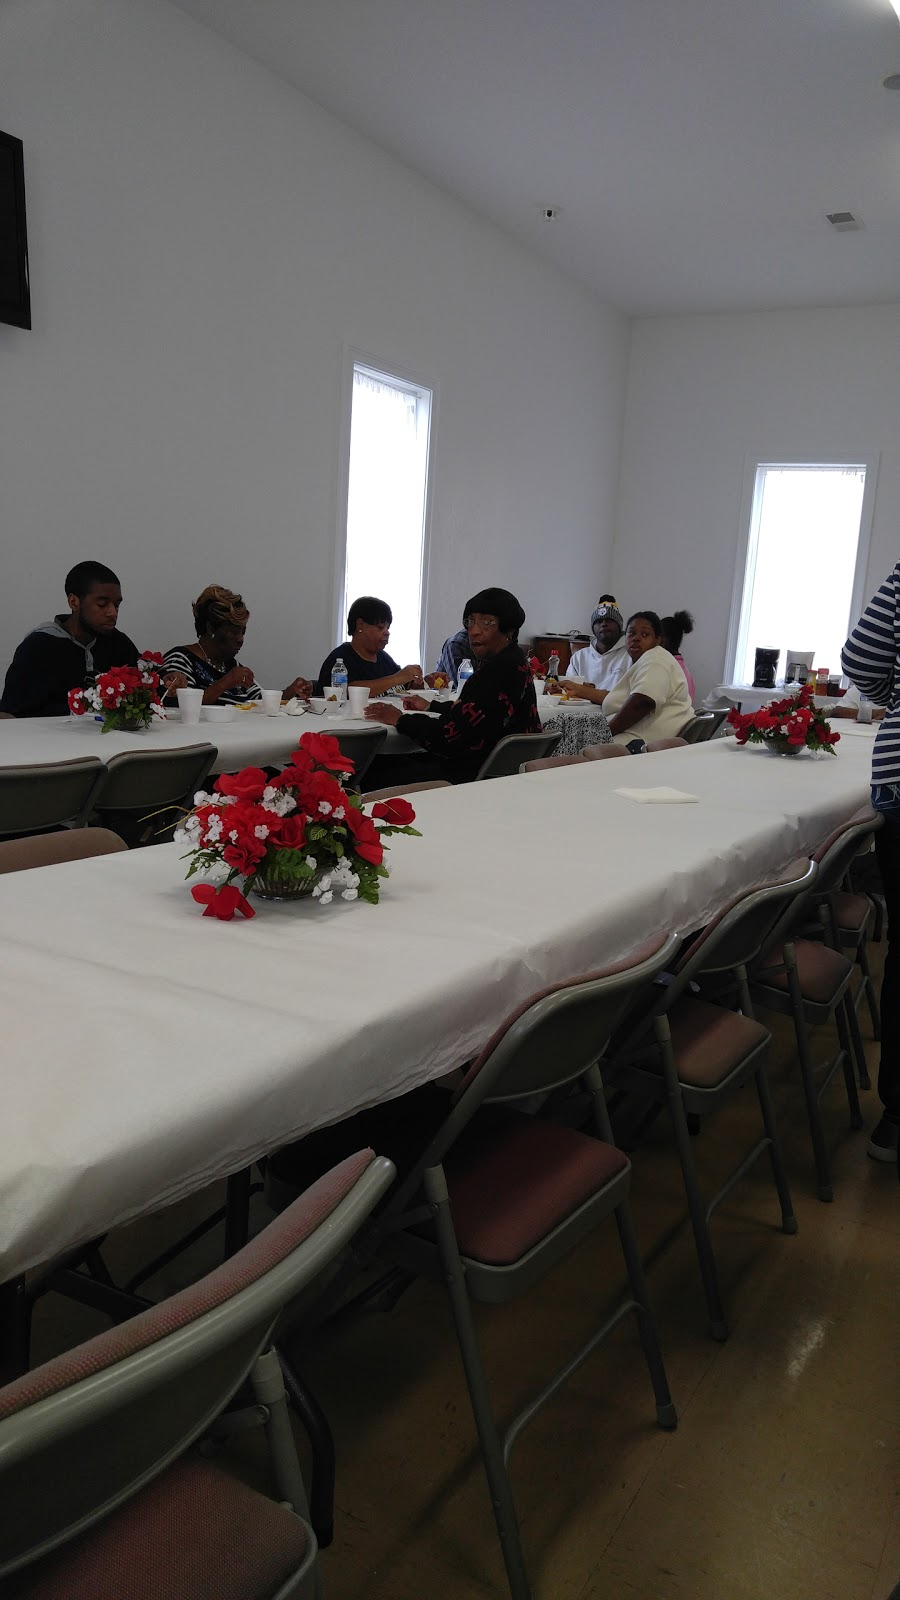 Mount Carmel Missionary Baptist Church - church    Photo 5 of 8   Address: 836 US-158, Elizabeth City, NC 27909, USA   Phone: (252) 771-5001